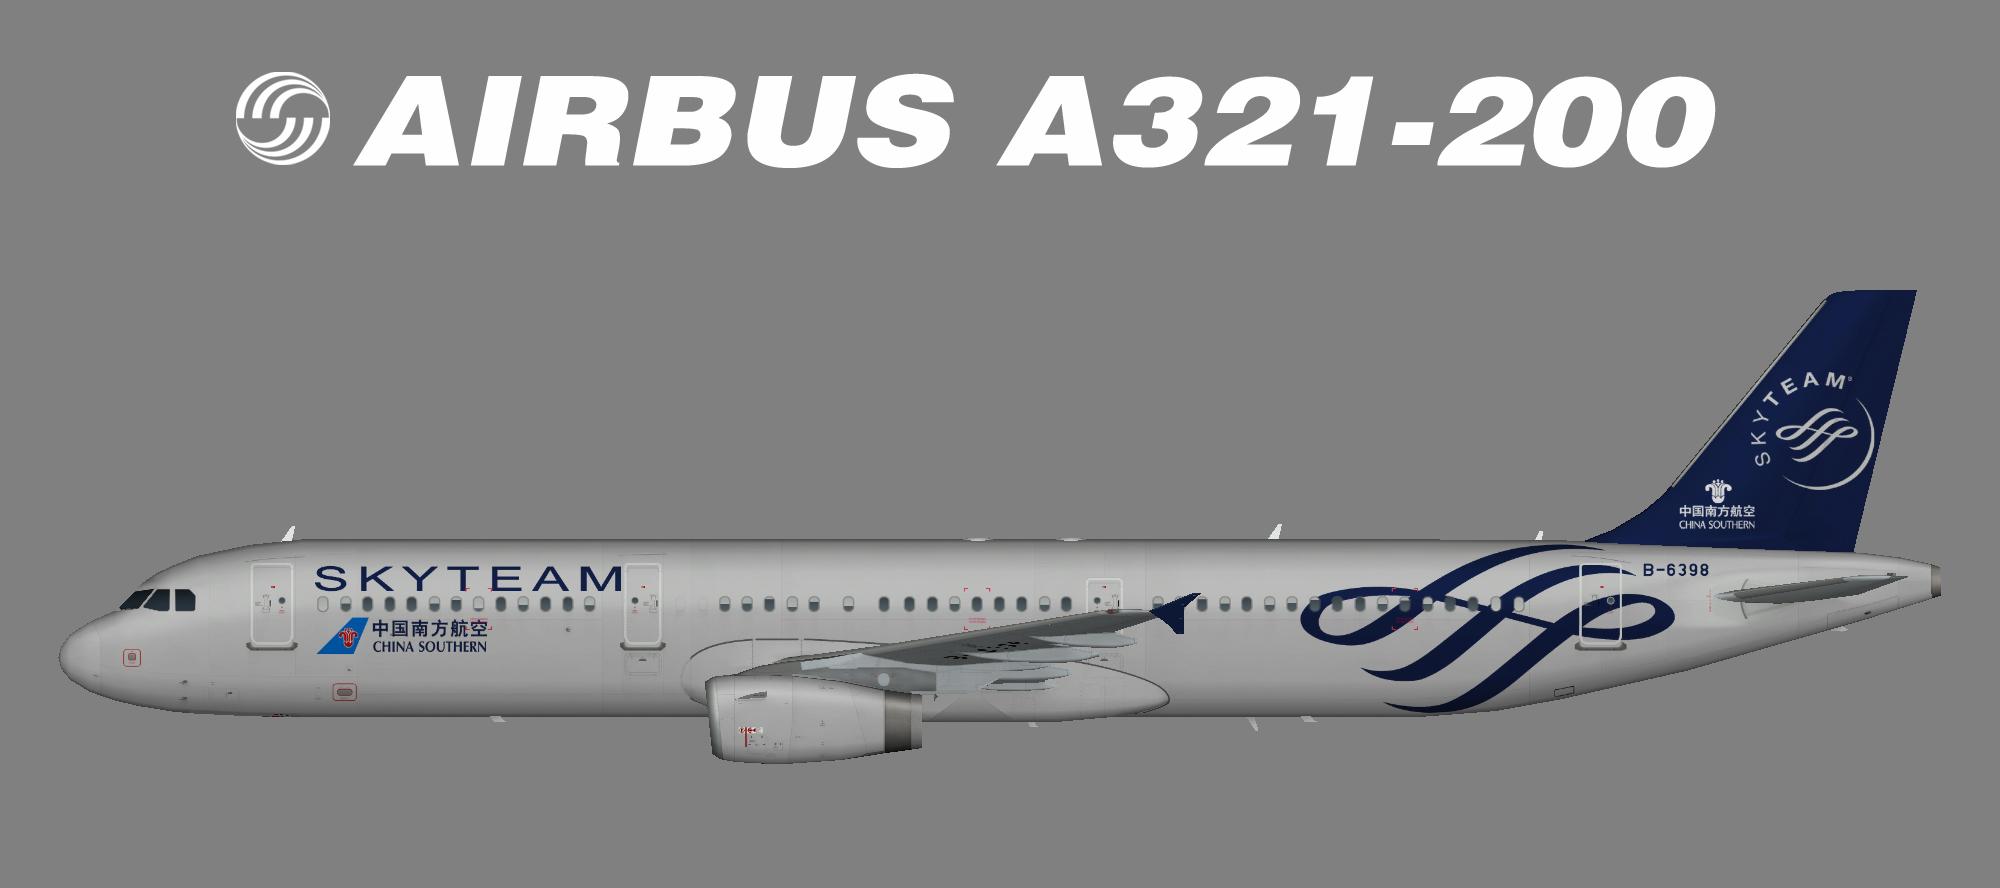 China Southern A321-200 Skyteam